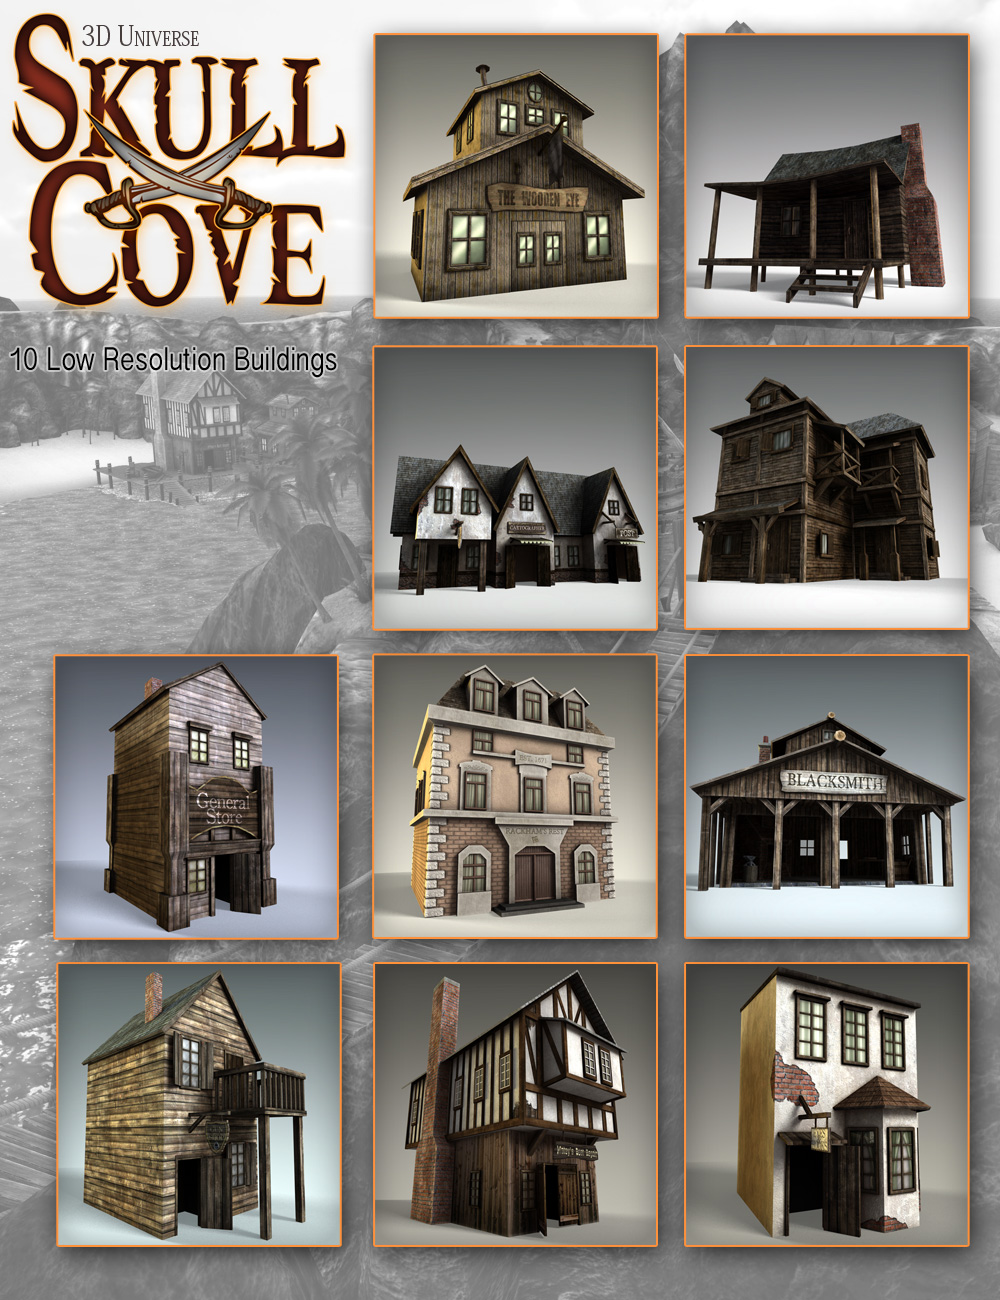 Skull Cove Buildings by: 3D Universe, 3D Models by Daz 3D